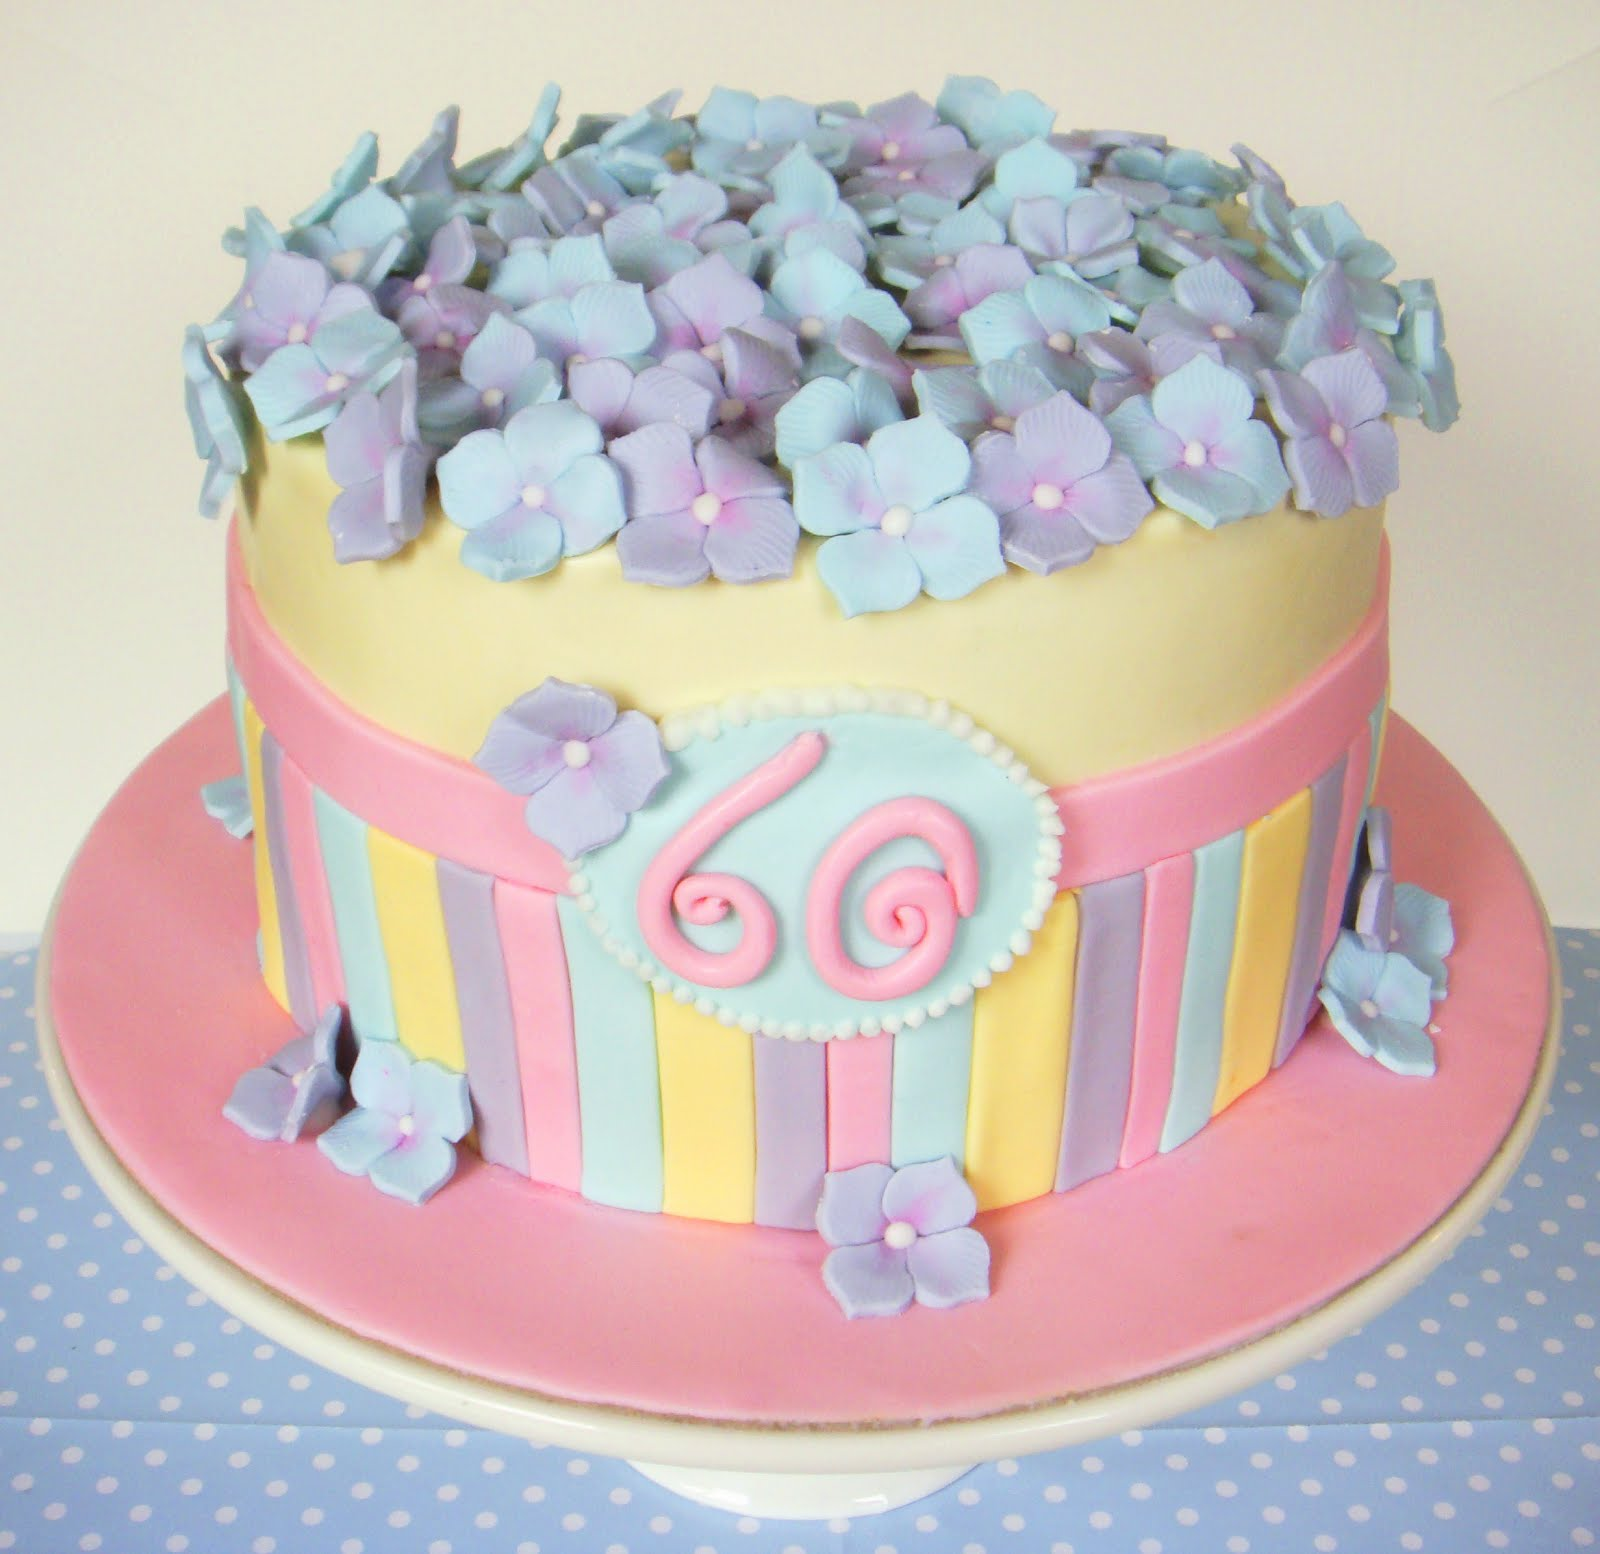 Butter Hearts Sugar: Pastel Hydrangea Cake